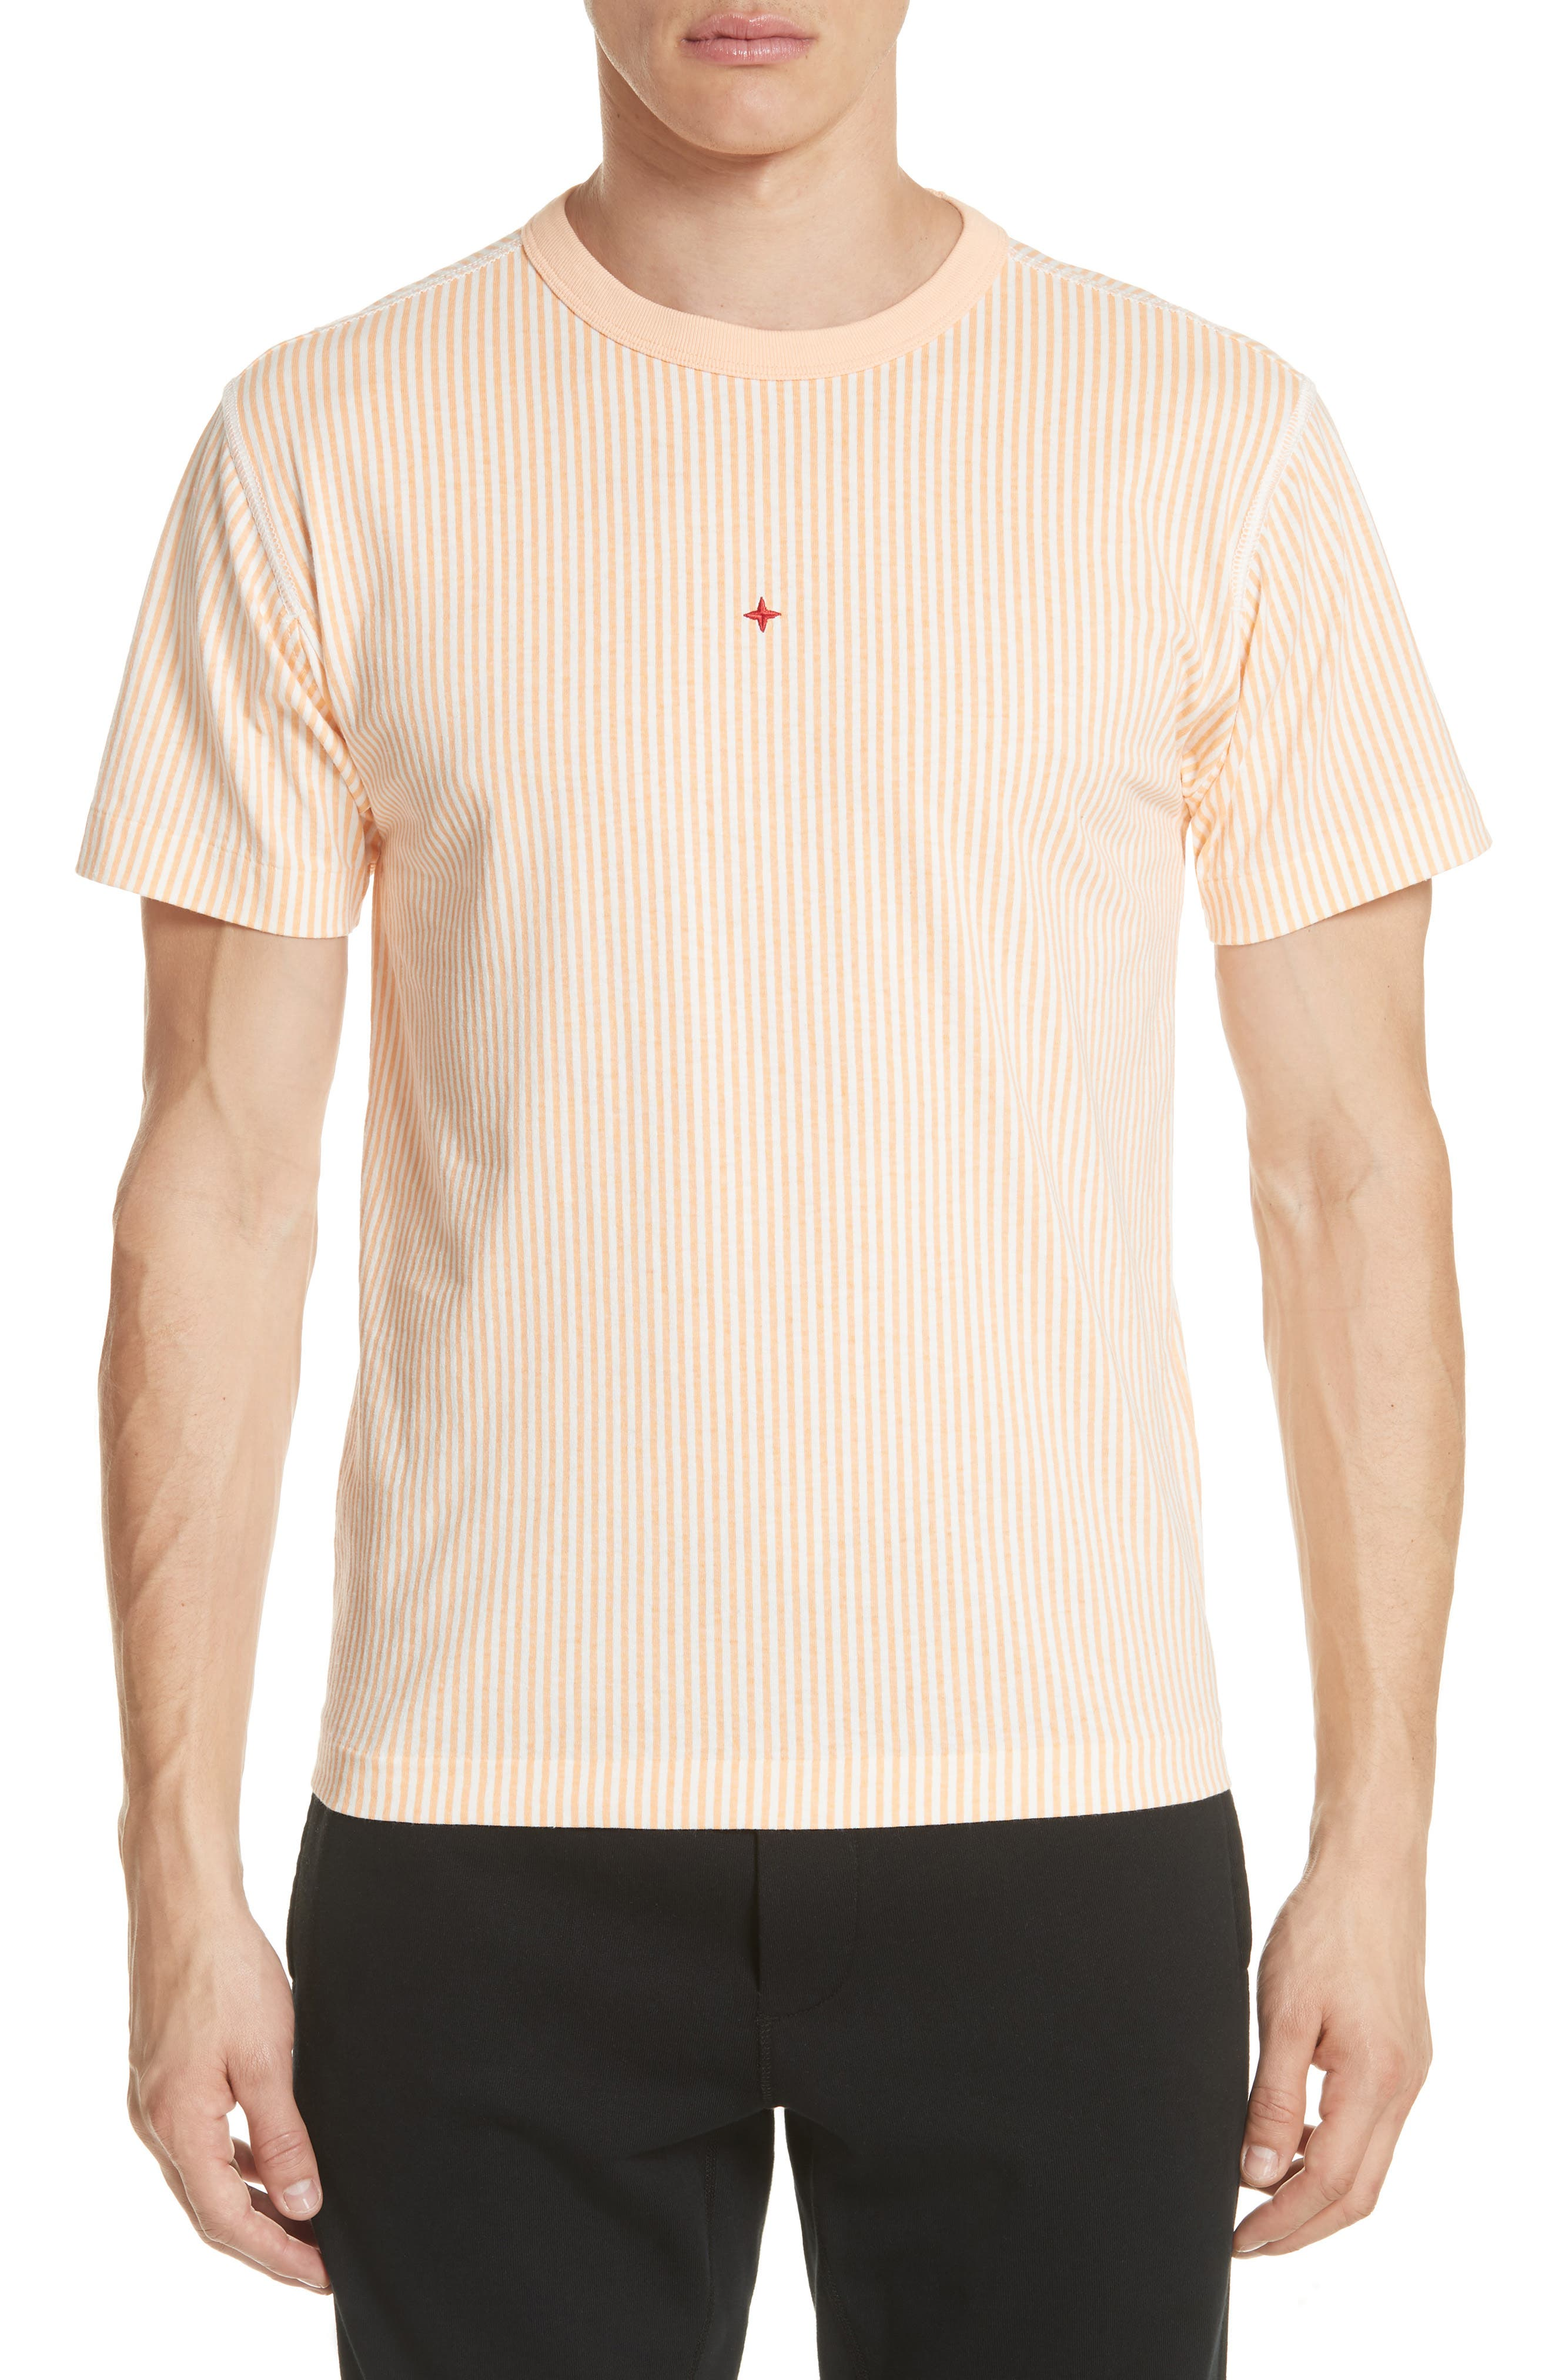 Alternate Image 1 Selected - Stone Island Stripe Marina T-Shirt